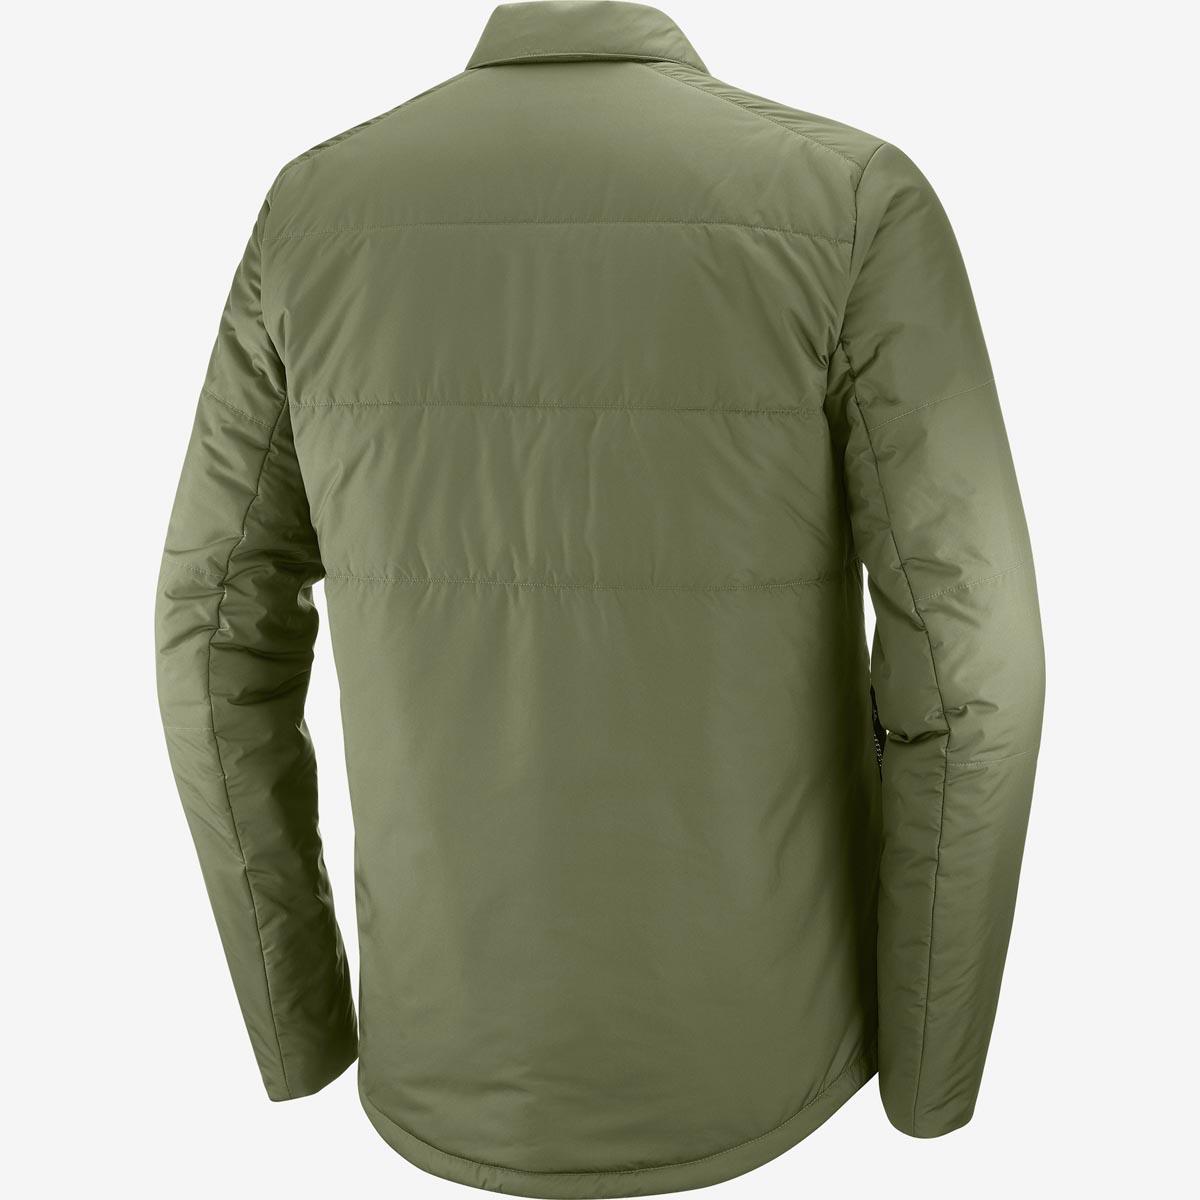 Рубашка утепленная SNOWSHELTER INSULATED SHIRT M